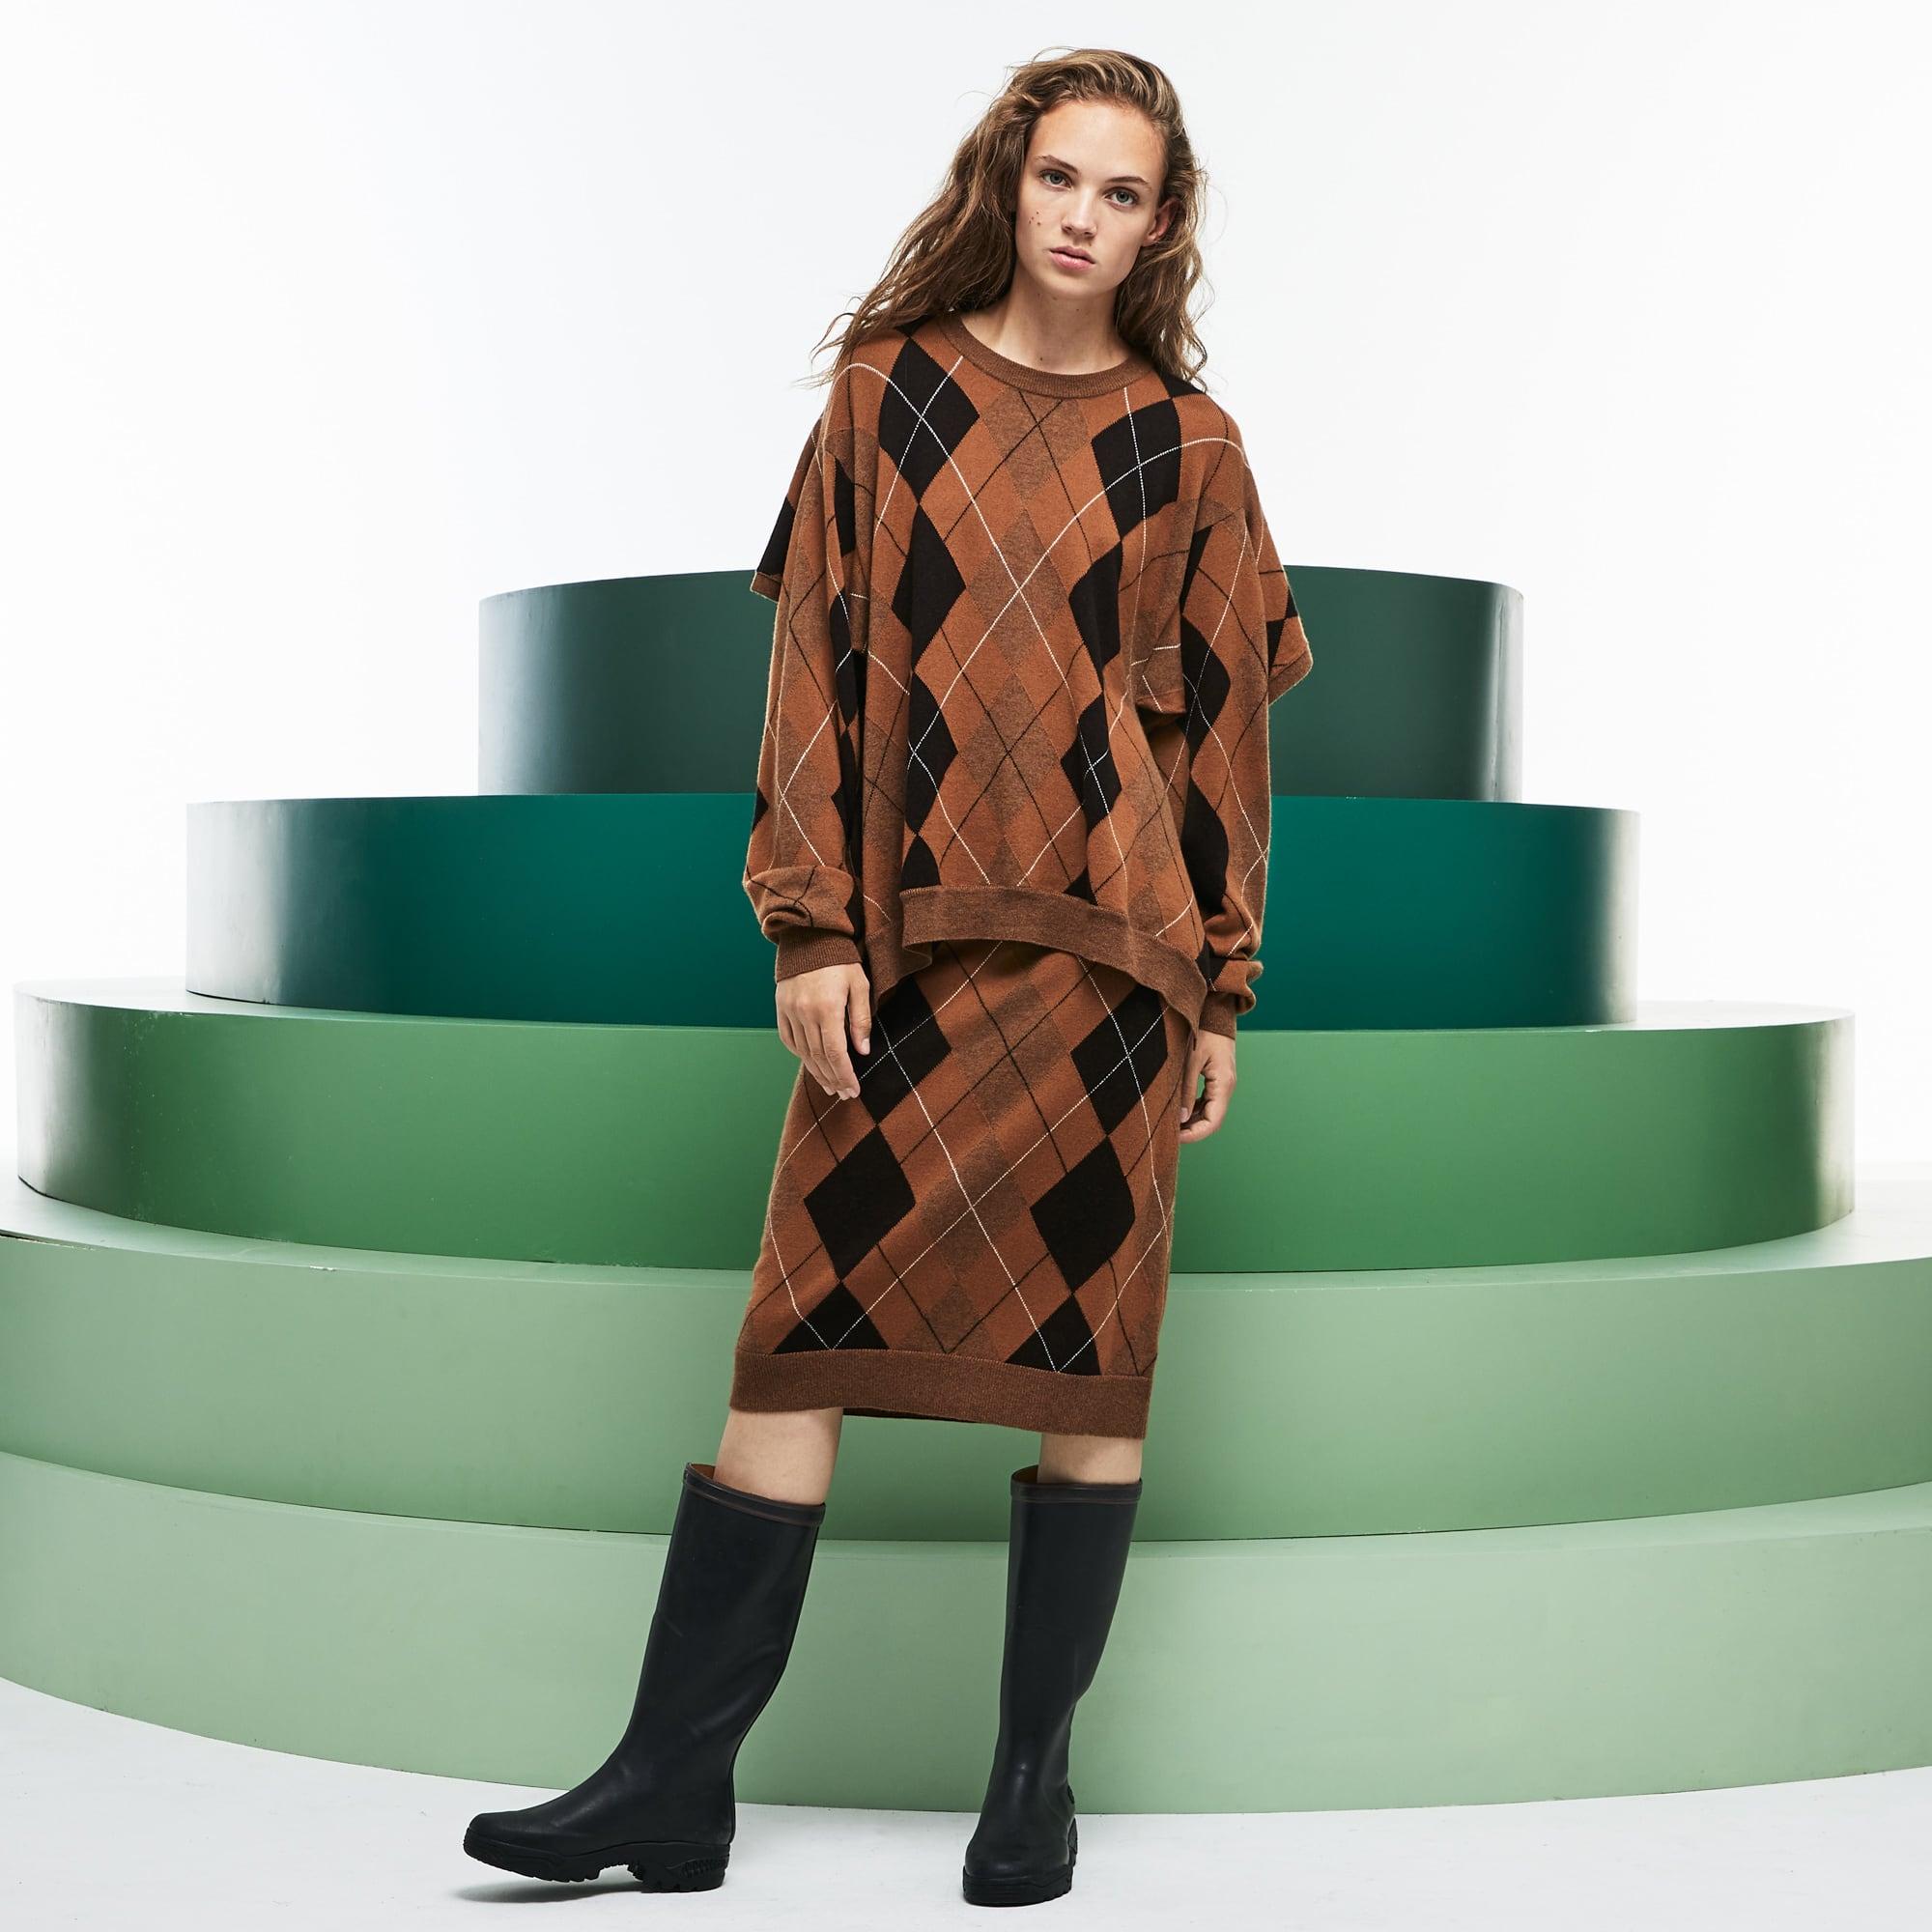 Women's Fashion Show Argyle Wool Jacquard Asymmetrical Skirt